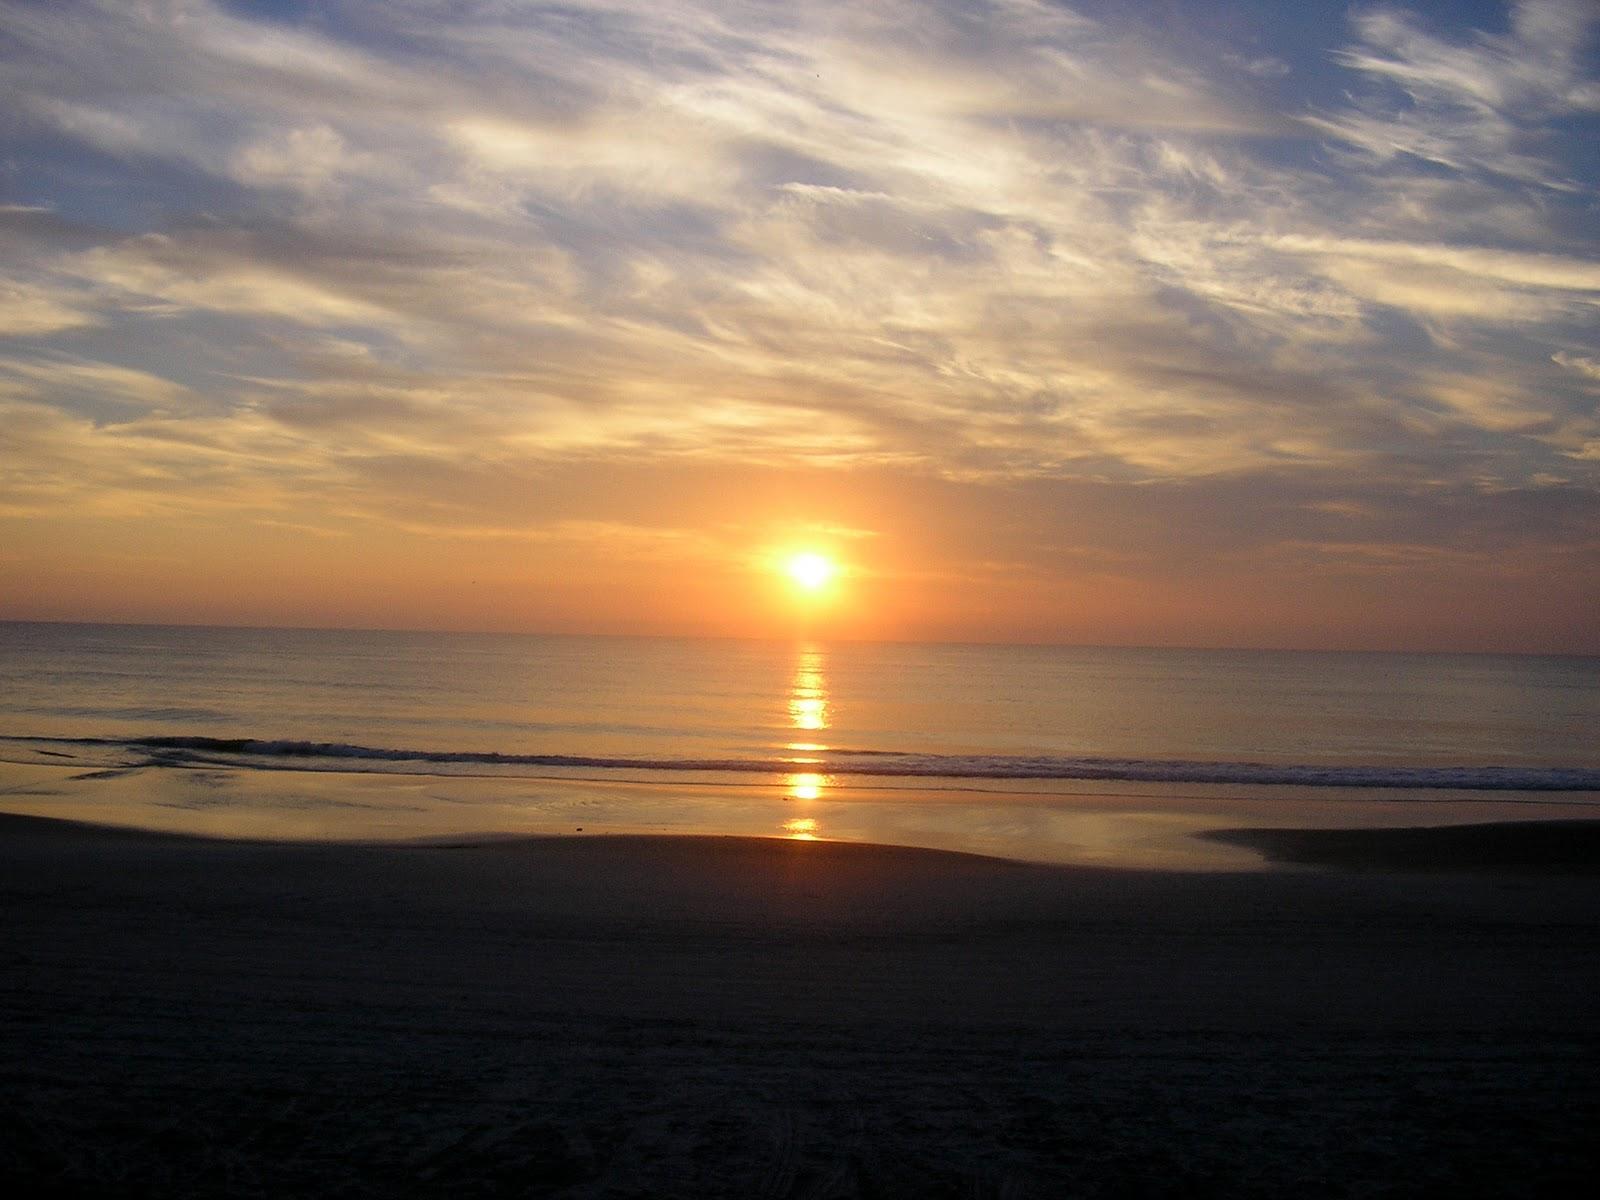 http://1.bp.blogspot.com/-Snbax7GpJgw/TVQkmZ_rwlI/AAAAAAAAF88/PBGqzwcXzD0/s1600/beach+wallpaper+%25288%2529.jpg